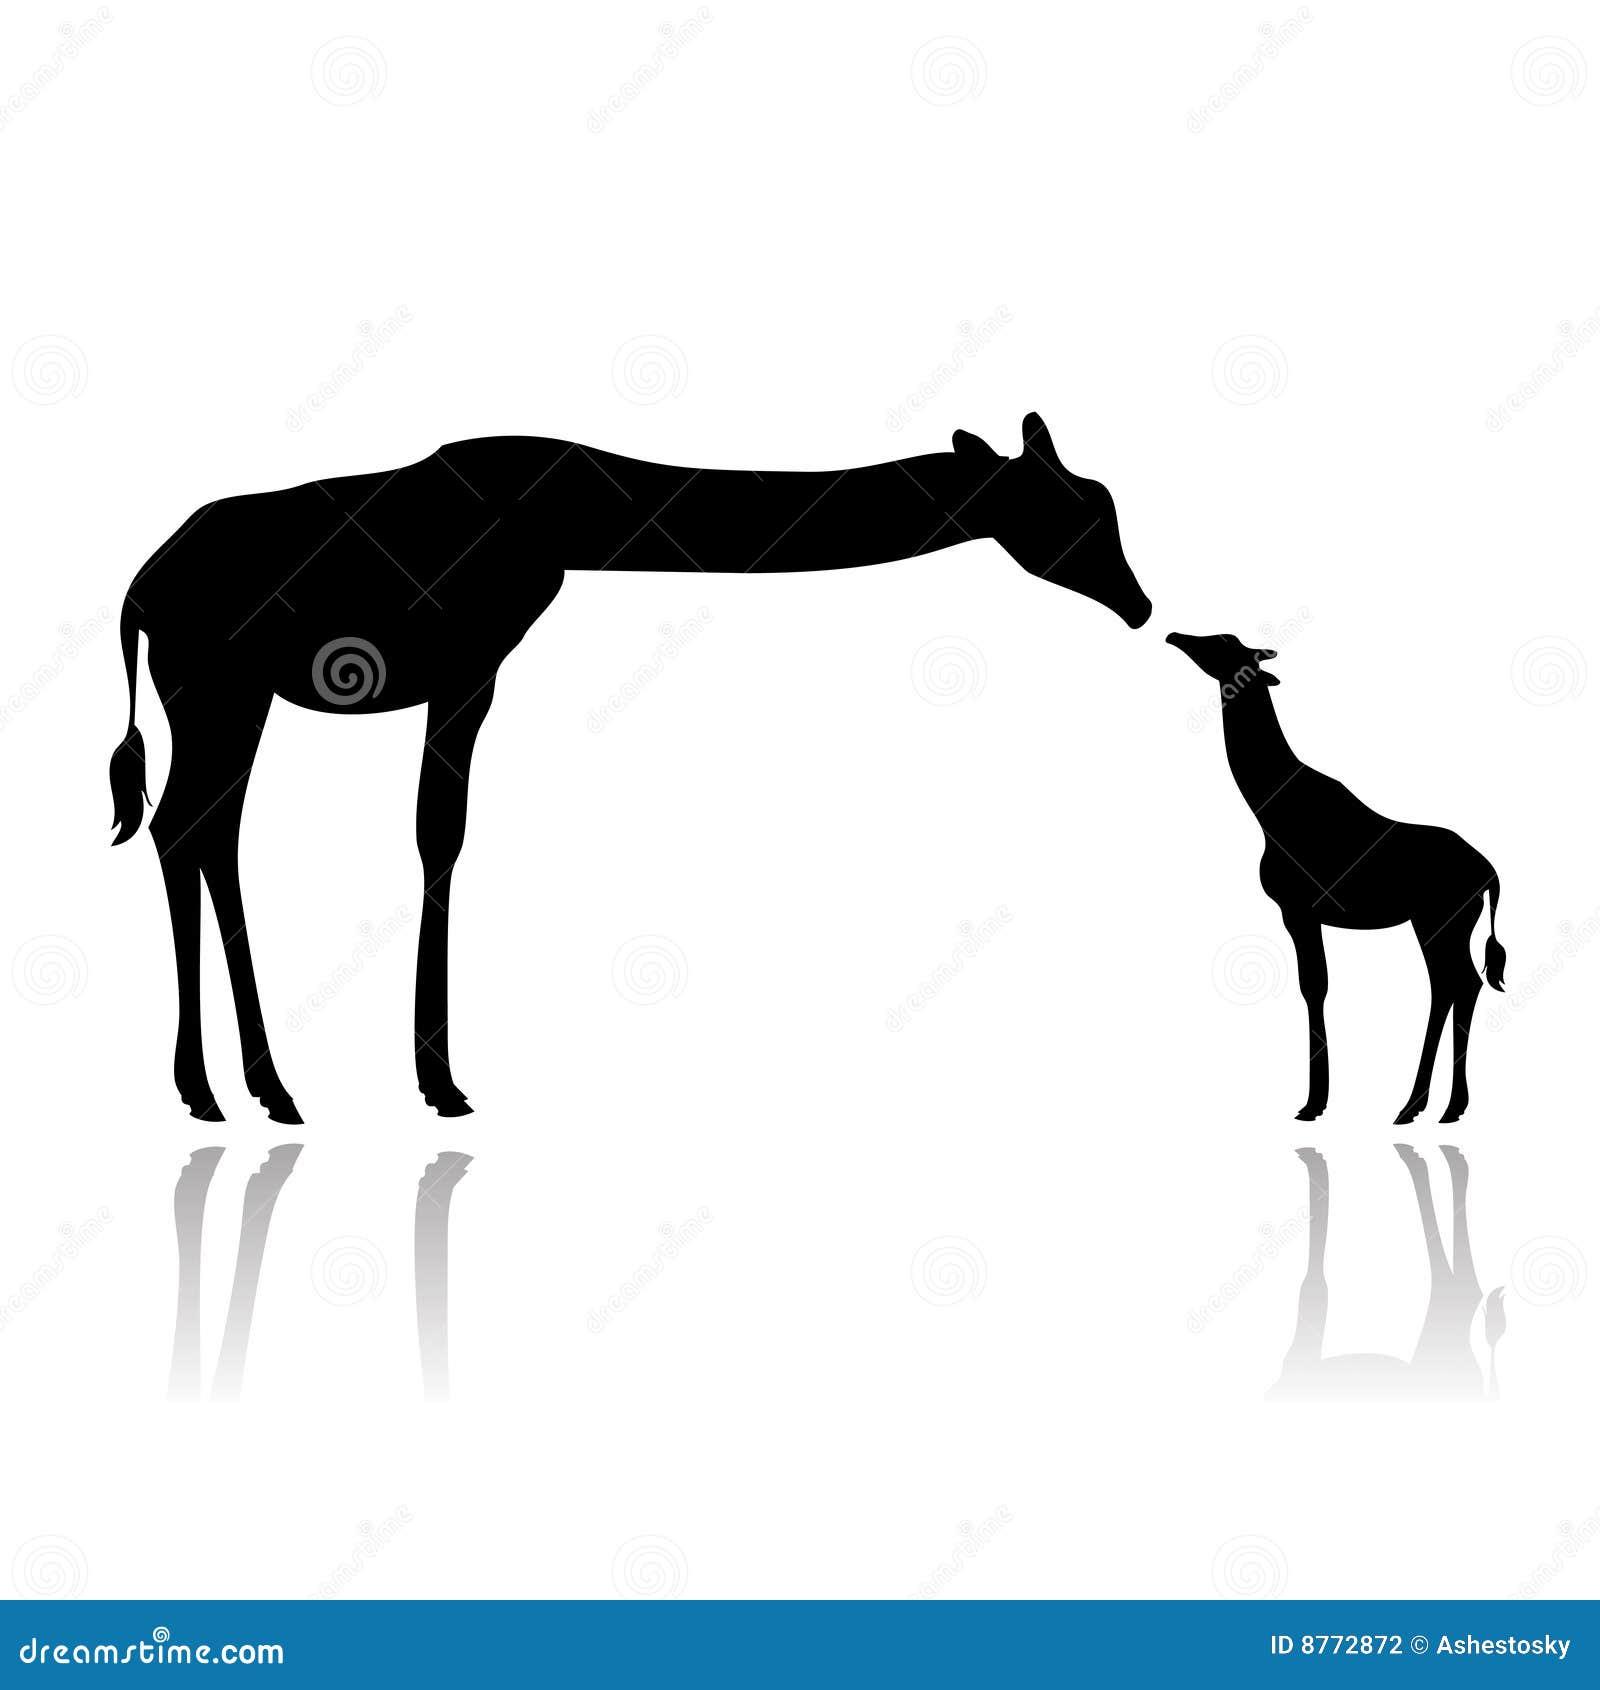 Vector illustration as silhouette of giraffe female feeding her cub.